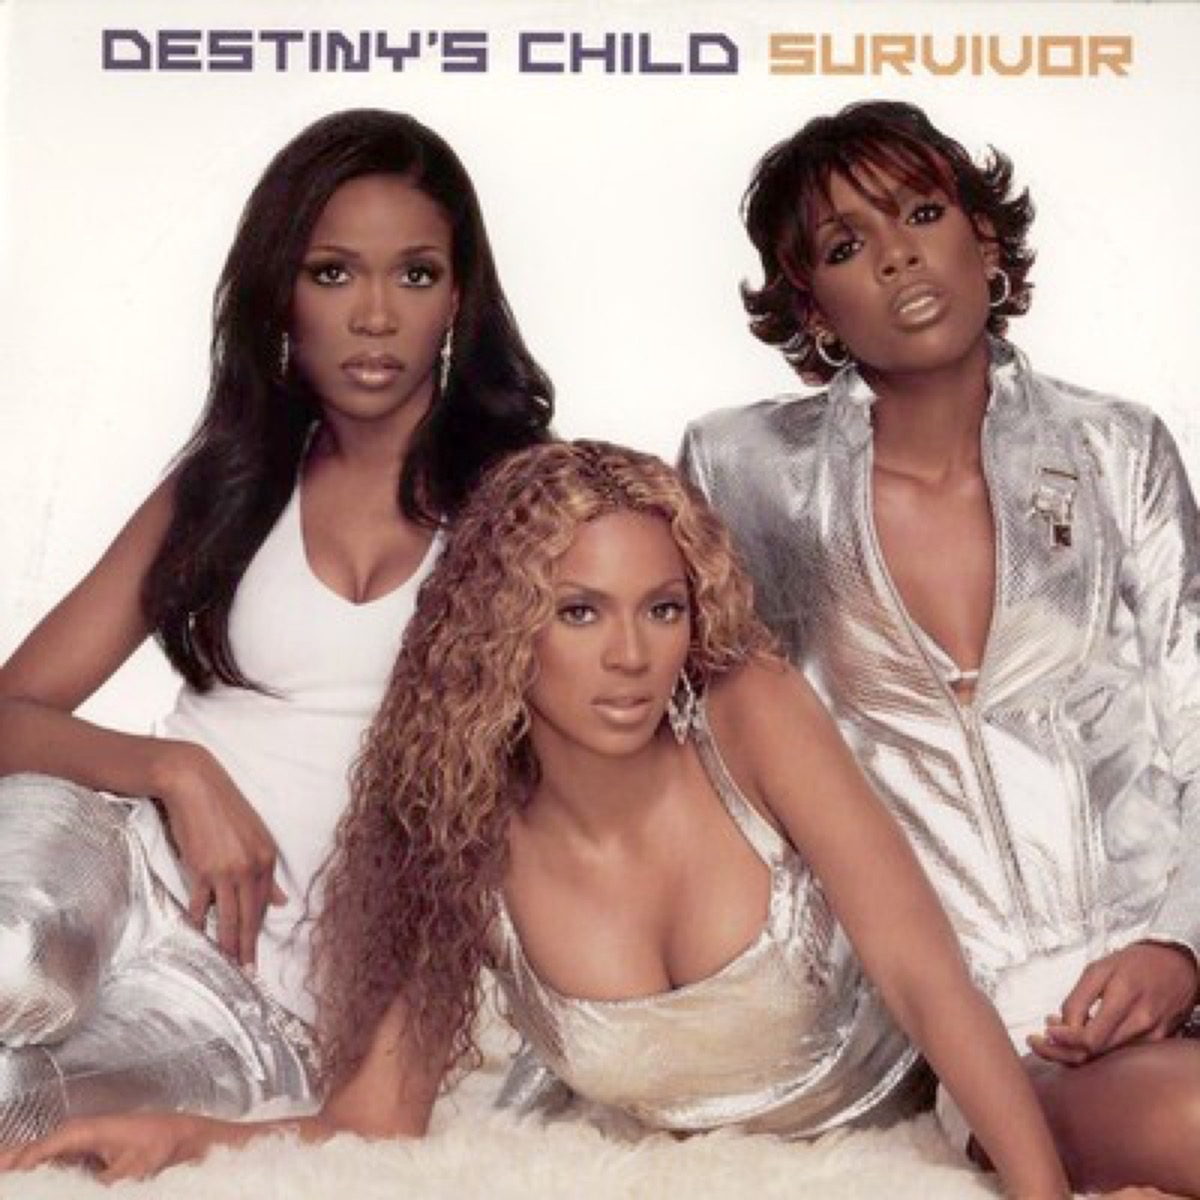 destiny's child survivor cover, best breakup songs